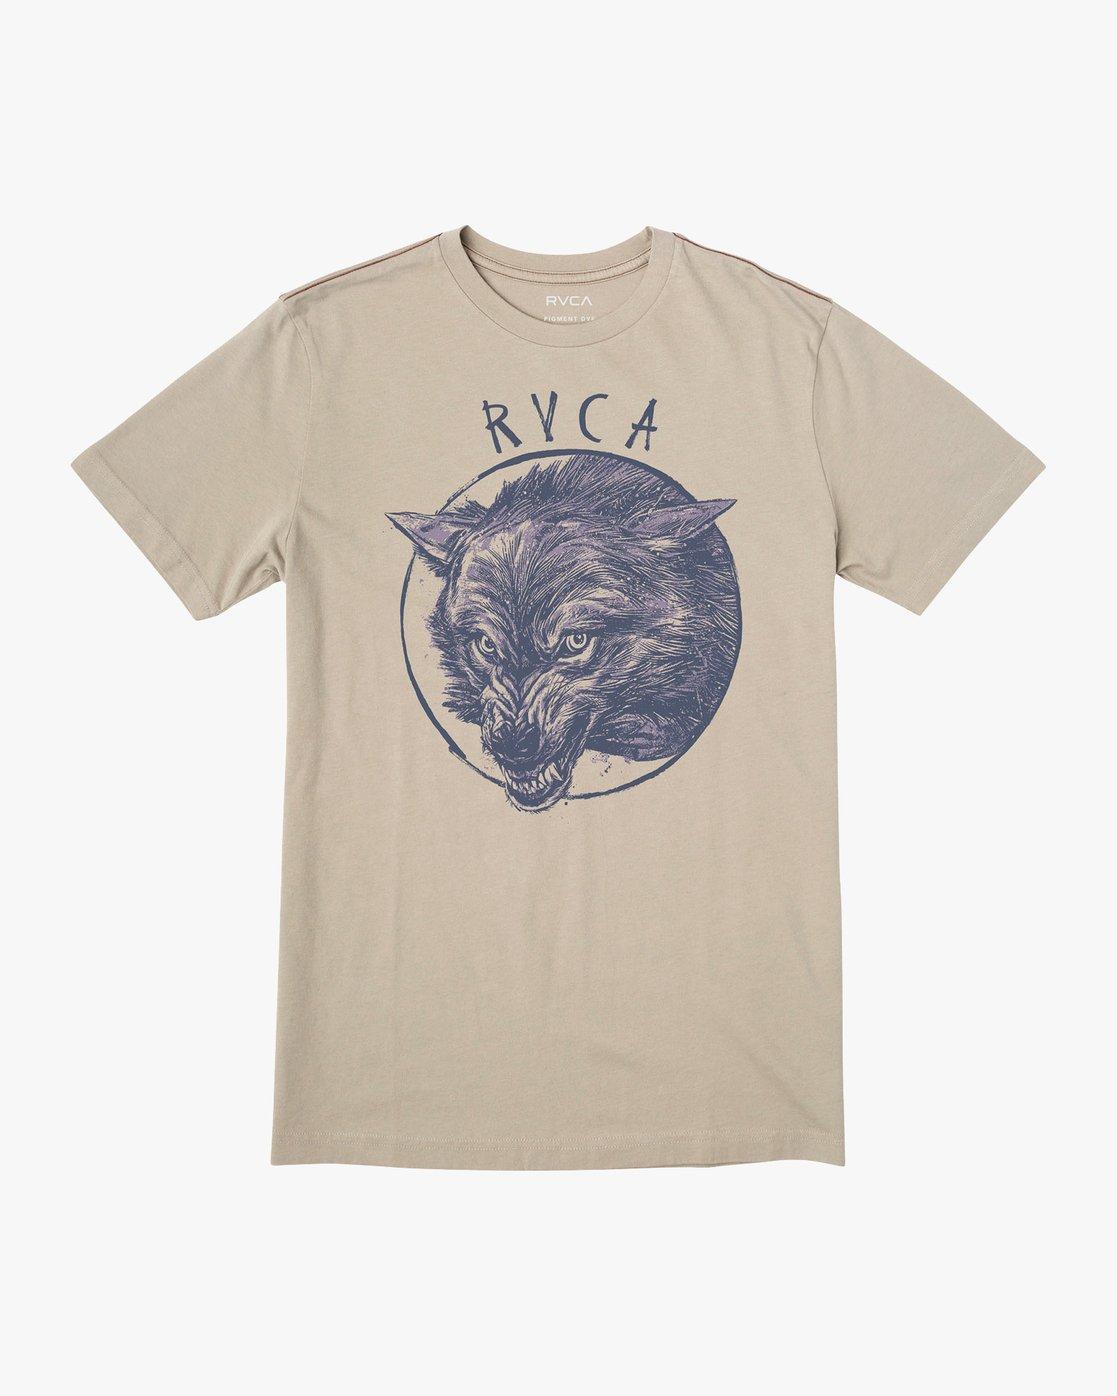 0 Ben Horton Snarl T-Shirt Multicolor M438VRSN RVCA